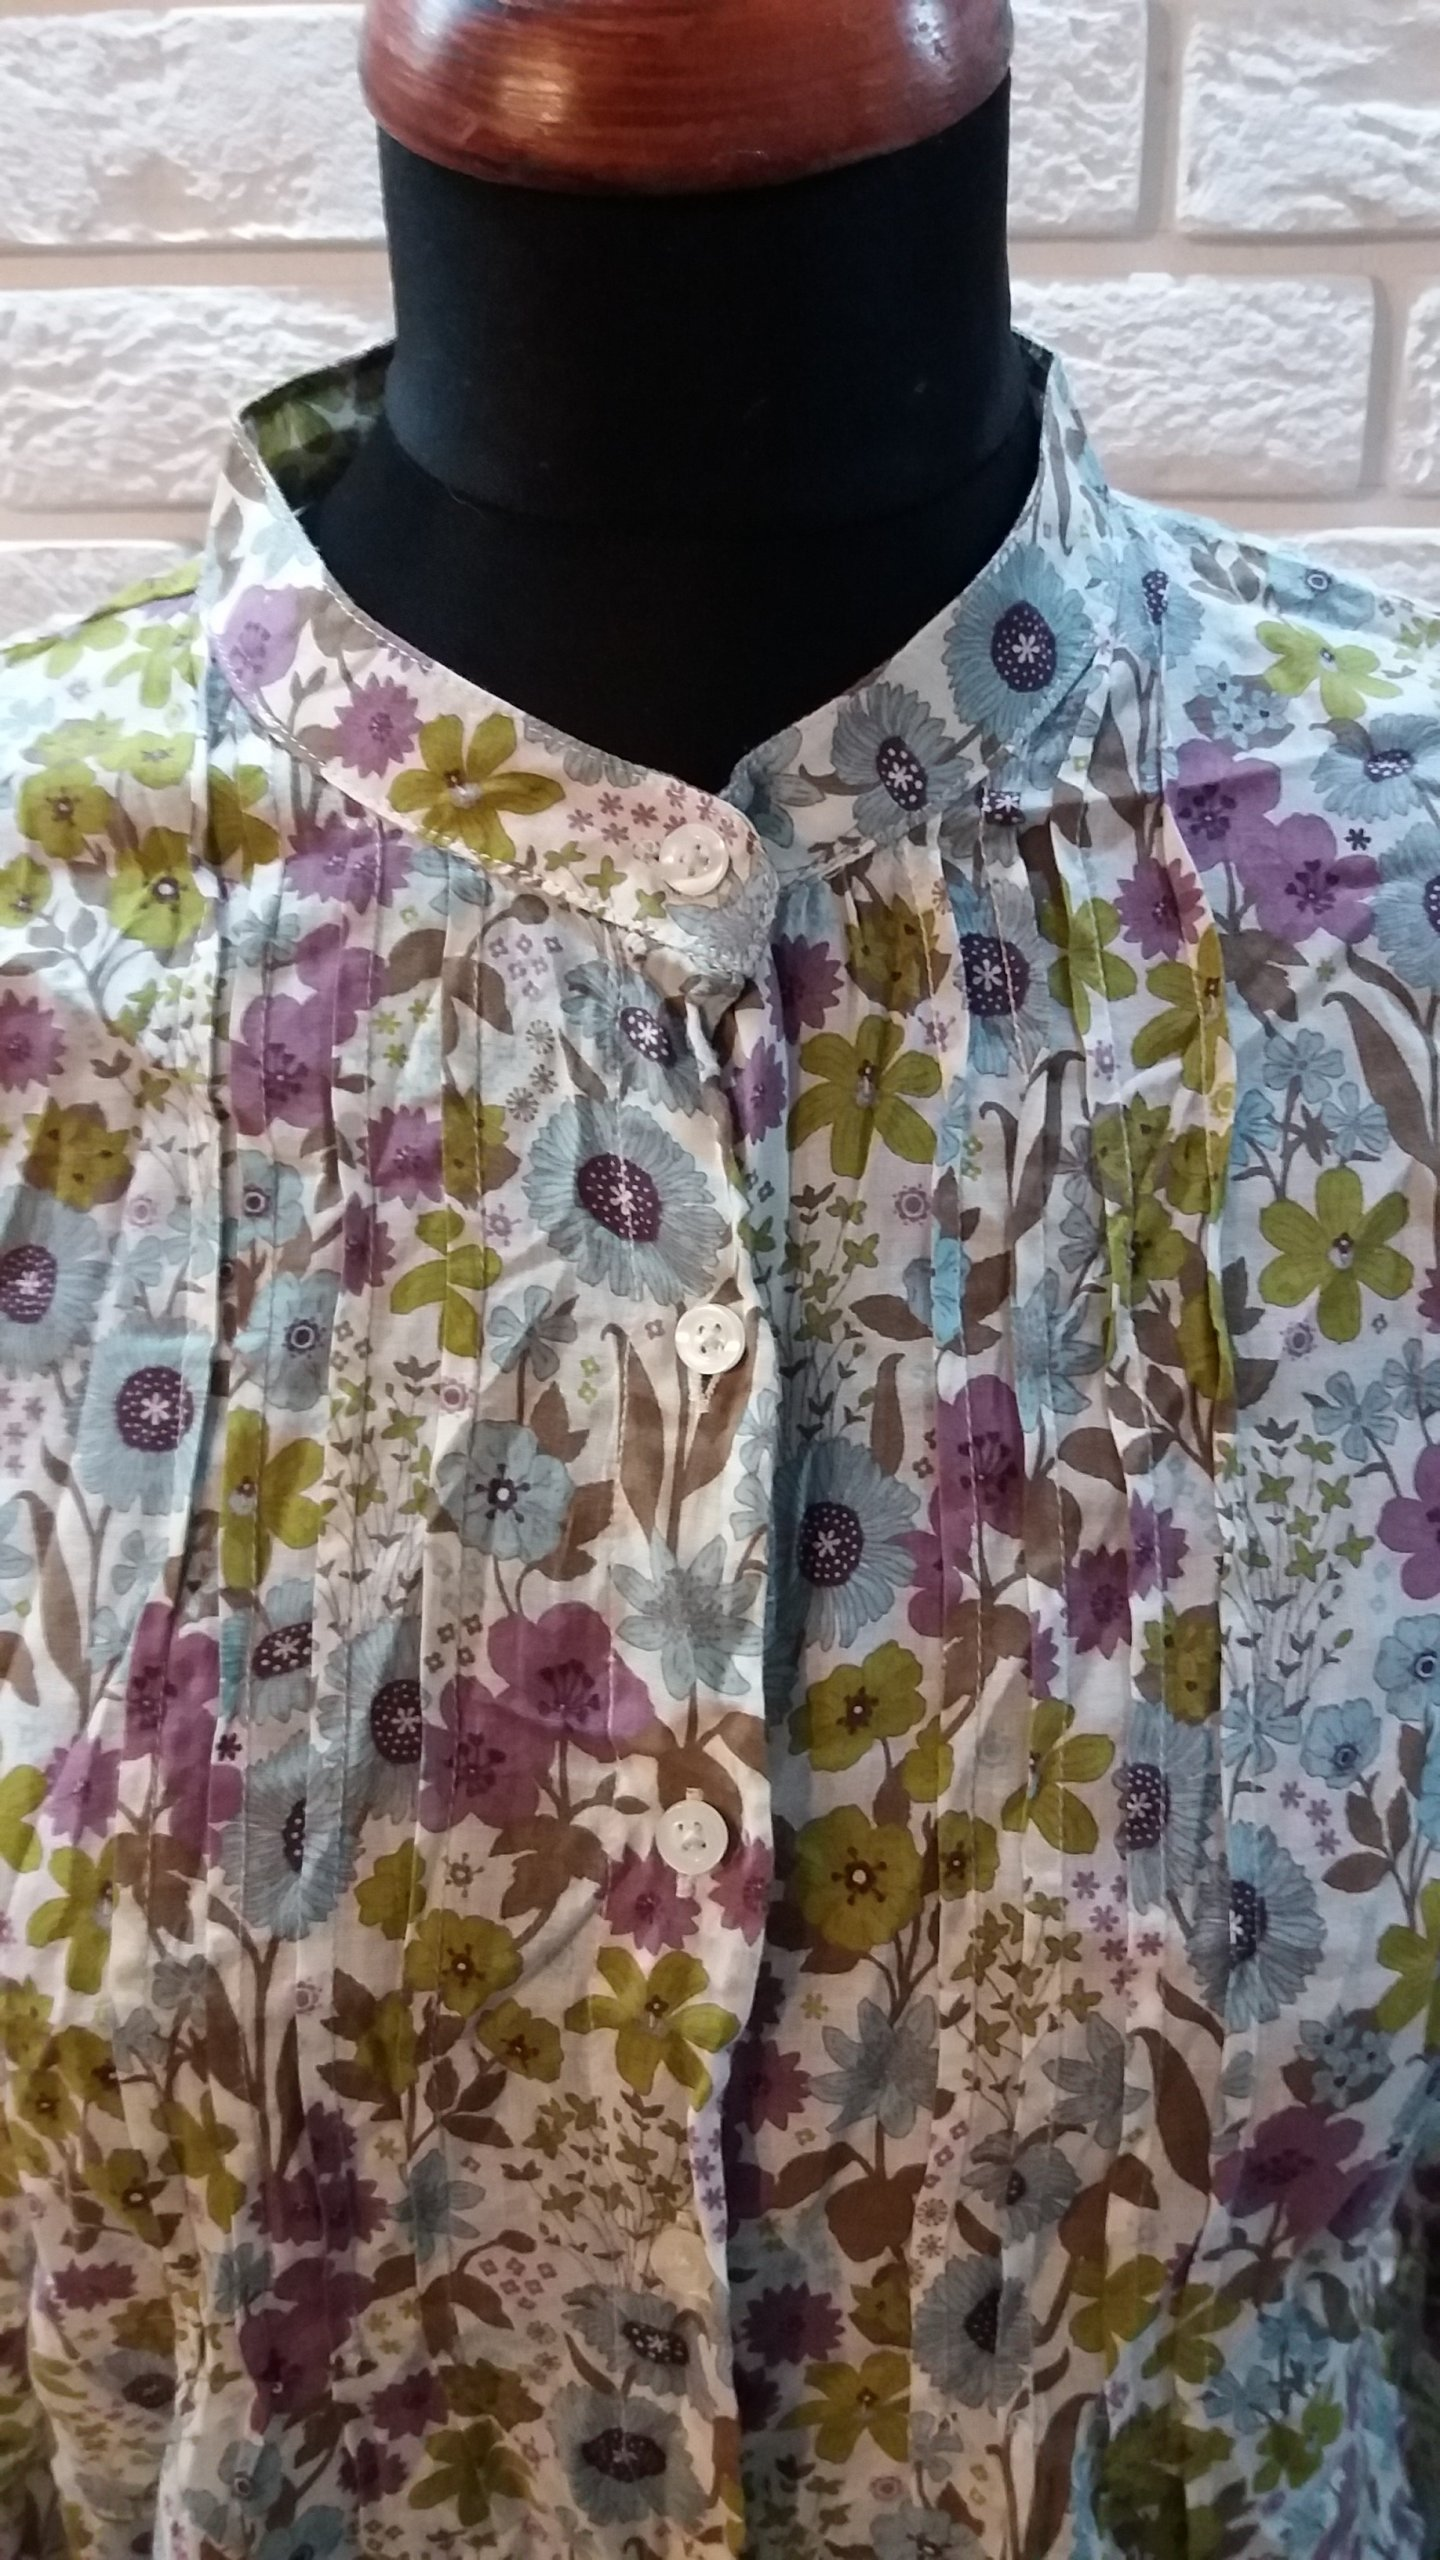 4943578eae1f4 MONTEGO bluzka damska w kwiatuszki 38 - 7181600618 - oficjalne archiwum  allegro